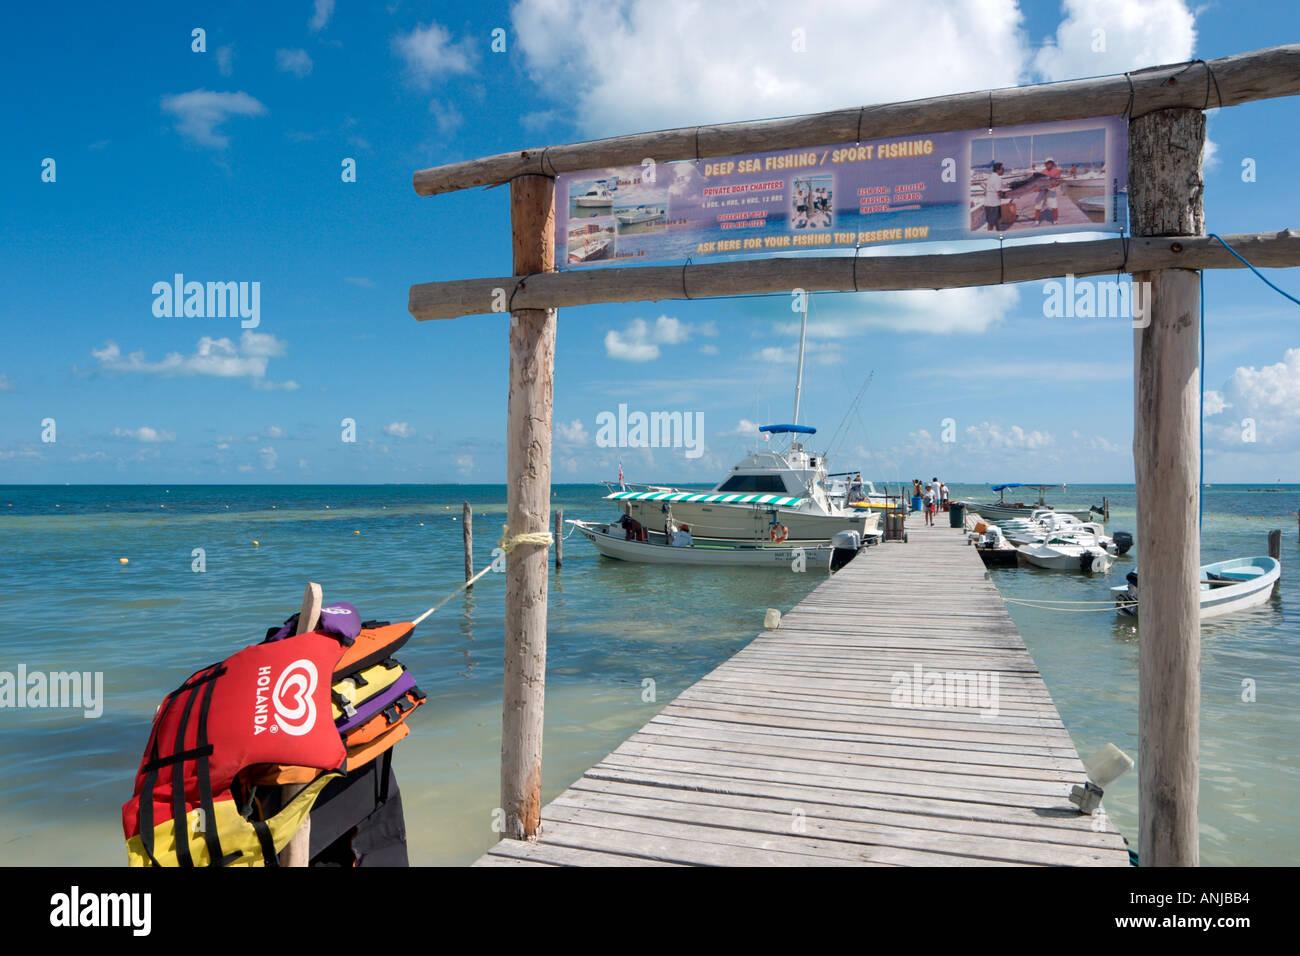 Jetty and Boat Charter on beach at far north of Cancun c Kilometer Marker 4 (KM4), Cancun, Yucatan Peninsula, Mexico - Stock Image